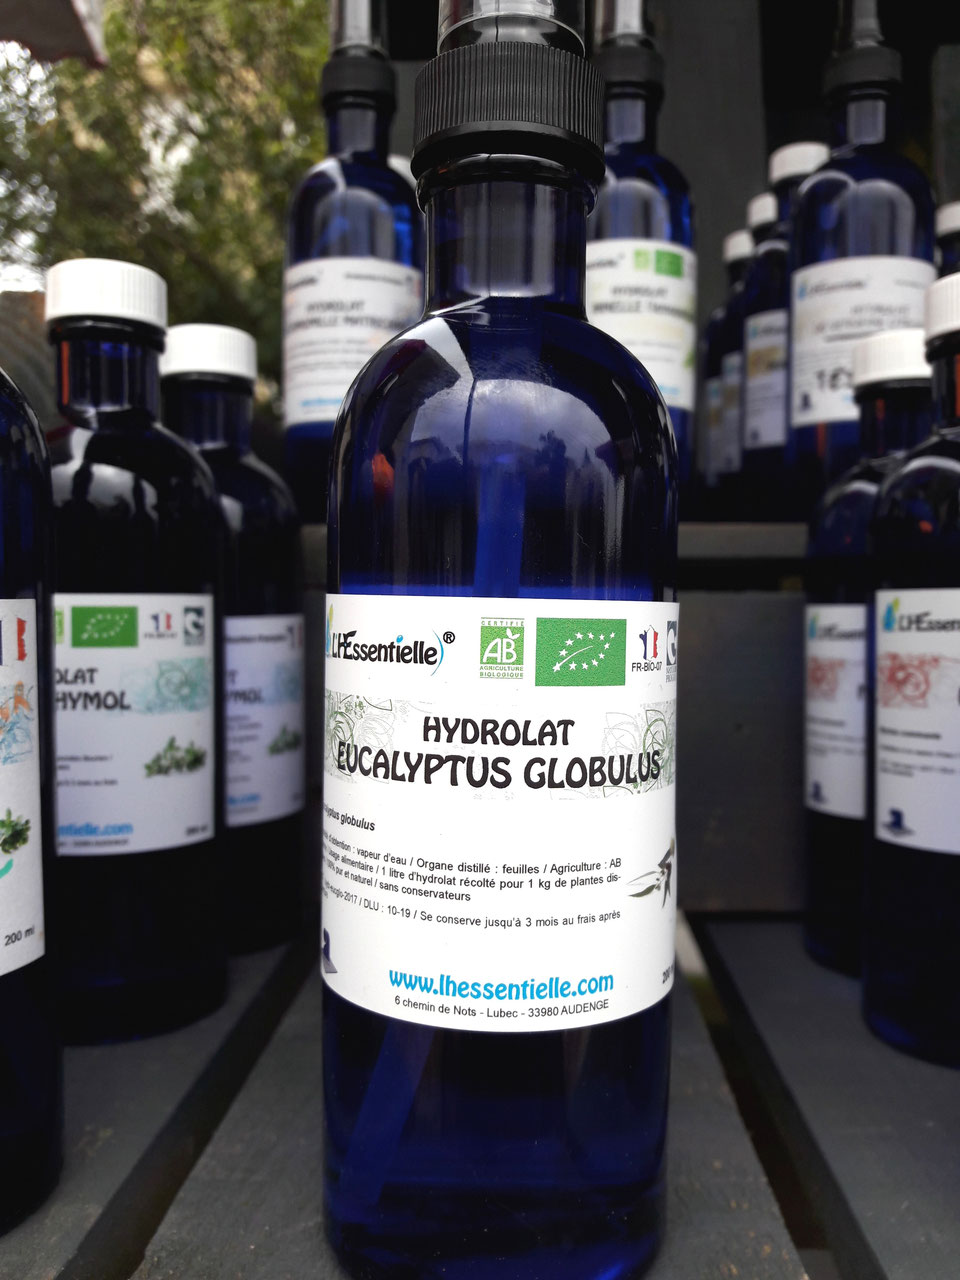 hyd eucalyptus globulus huiles essentielles bio l 39 hessentielle 100 pures et naturelles. Black Bedroom Furniture Sets. Home Design Ideas